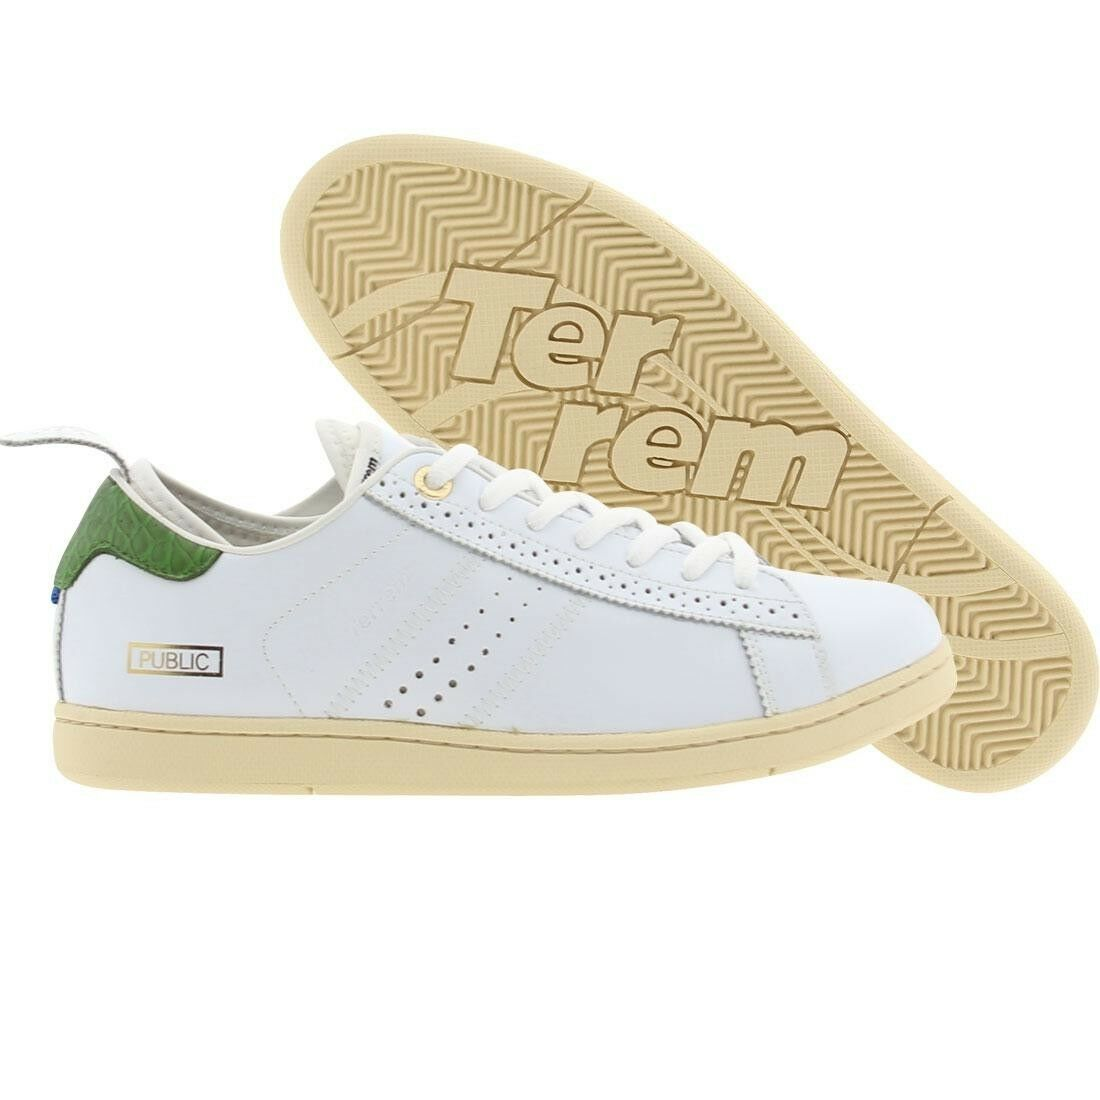 189.99  190 Terrem Men Public Cl (Weiß   Grün) 10WCL-WHTGRN